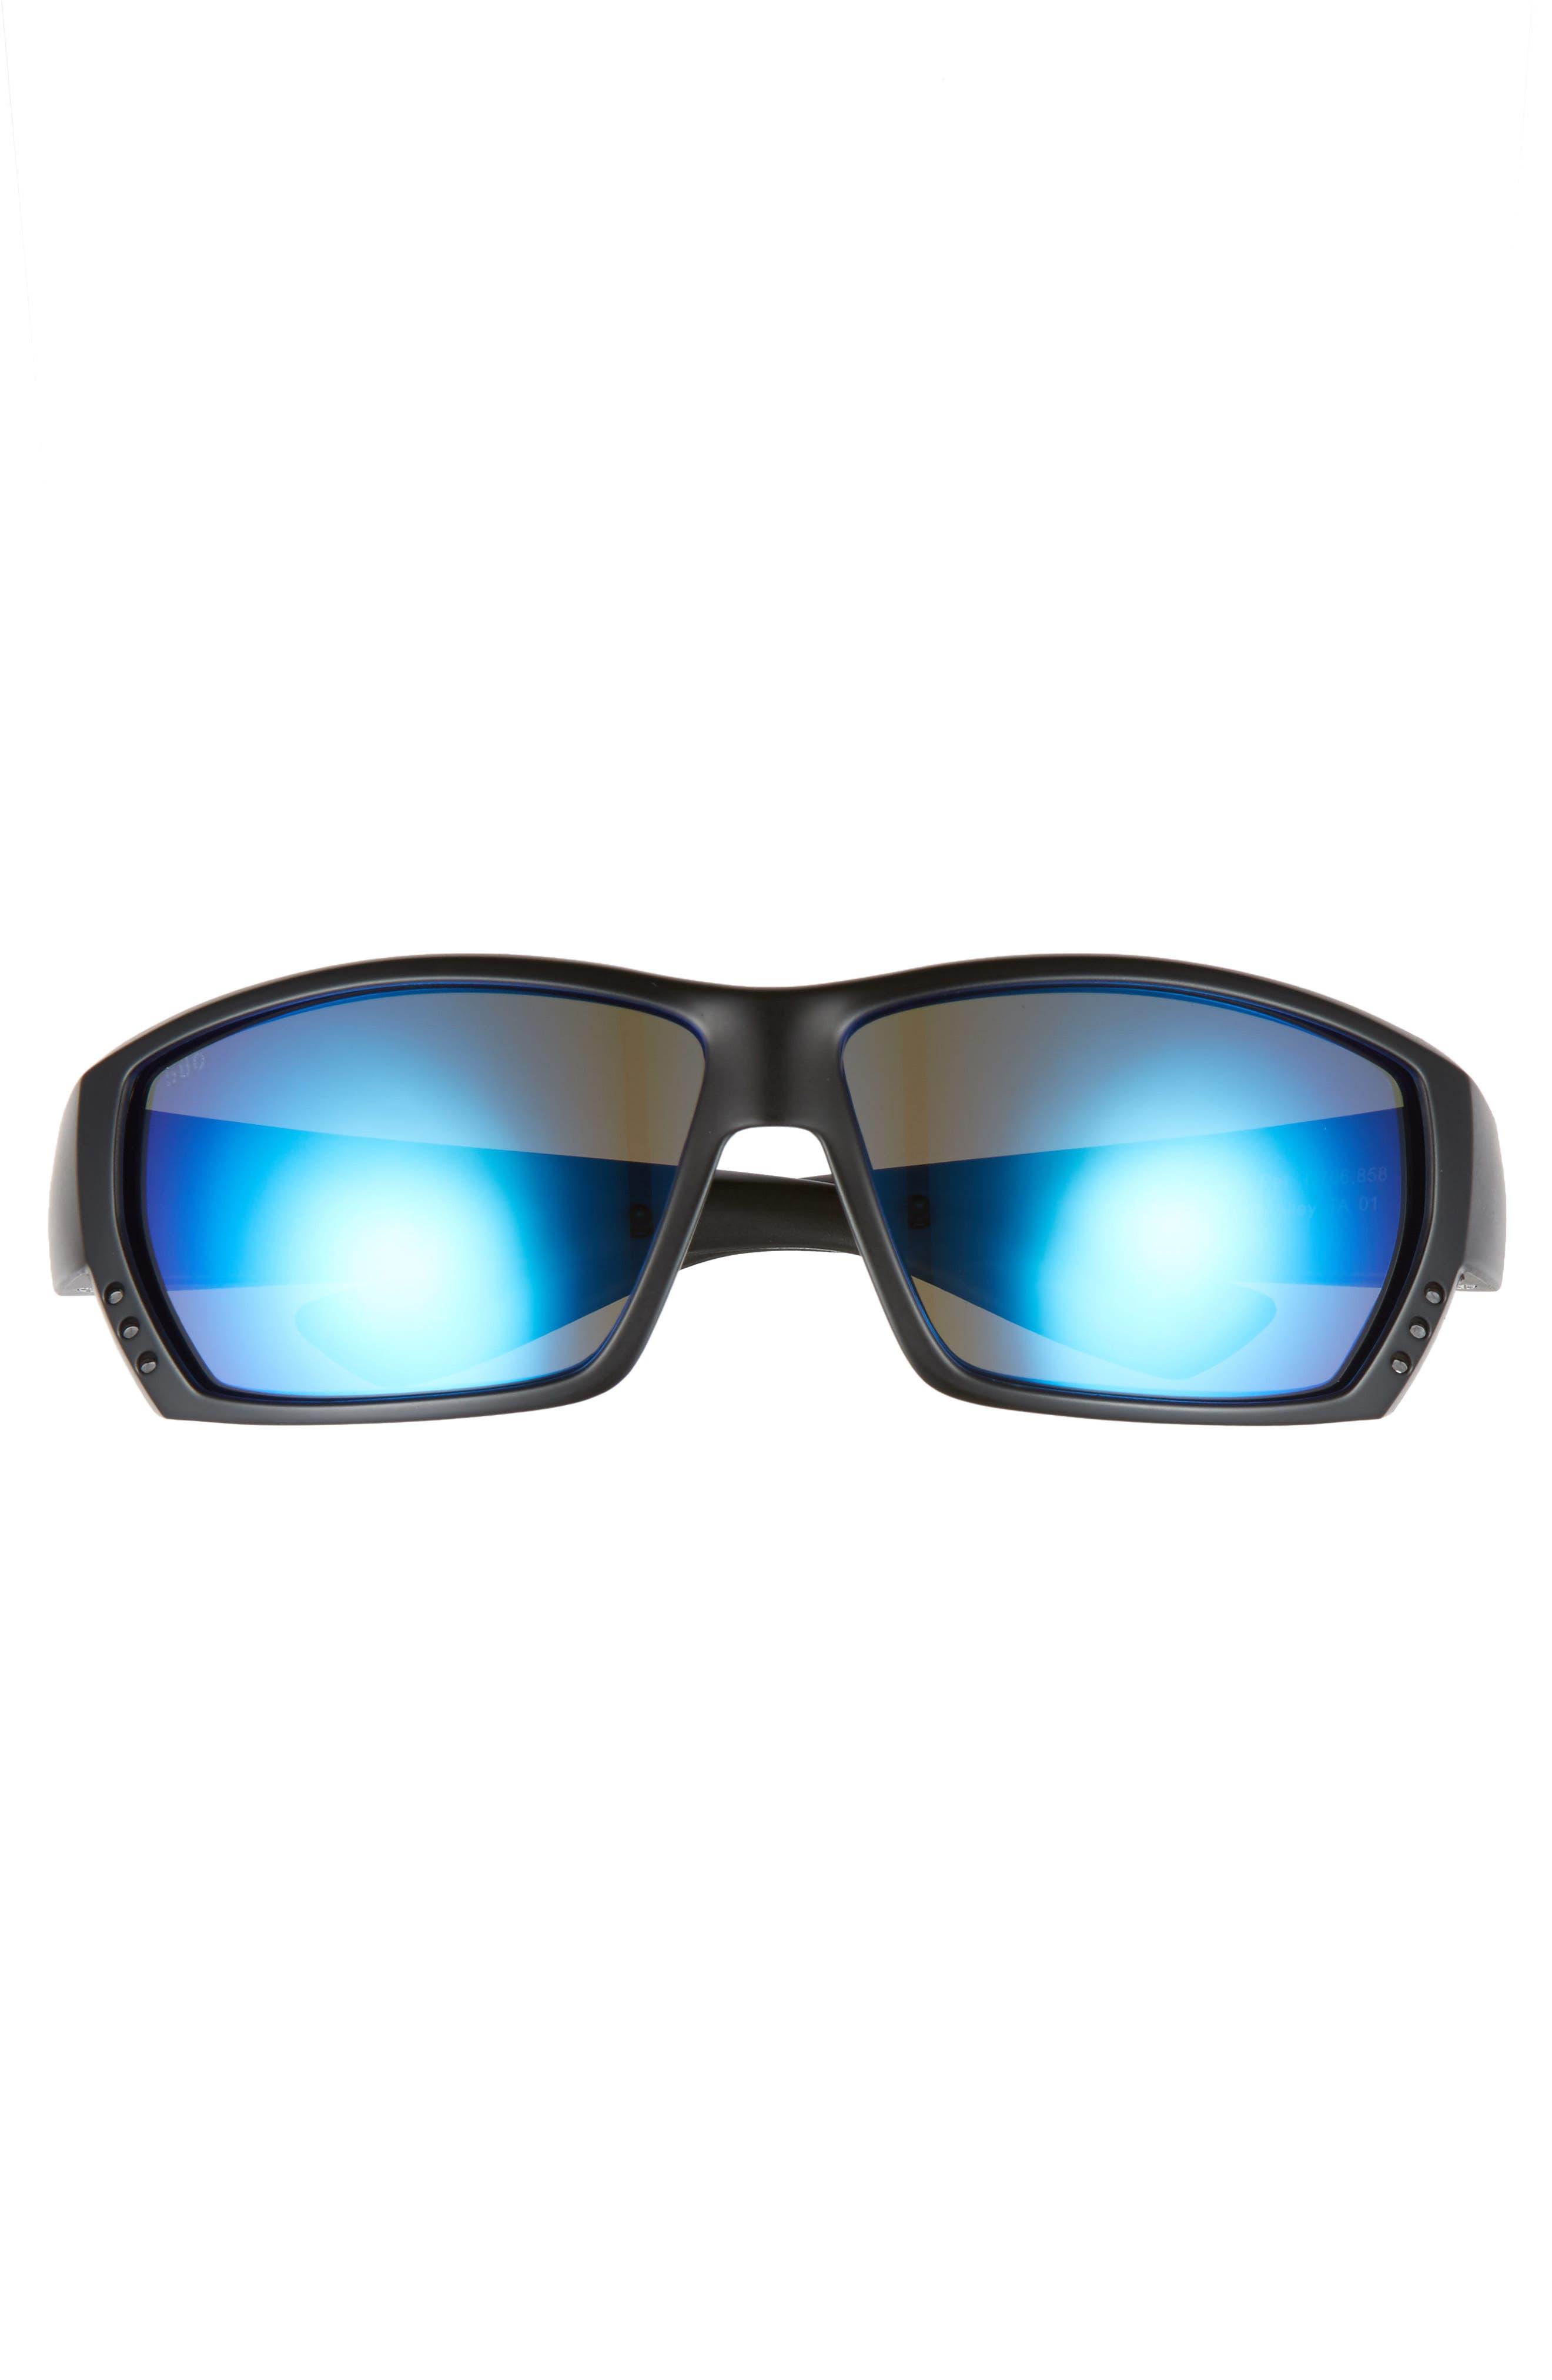 Tuna Alley 60mm Polarized Sunglasses,                             Alternate thumbnail 2, color,                             Blackout/ Blue Mirror